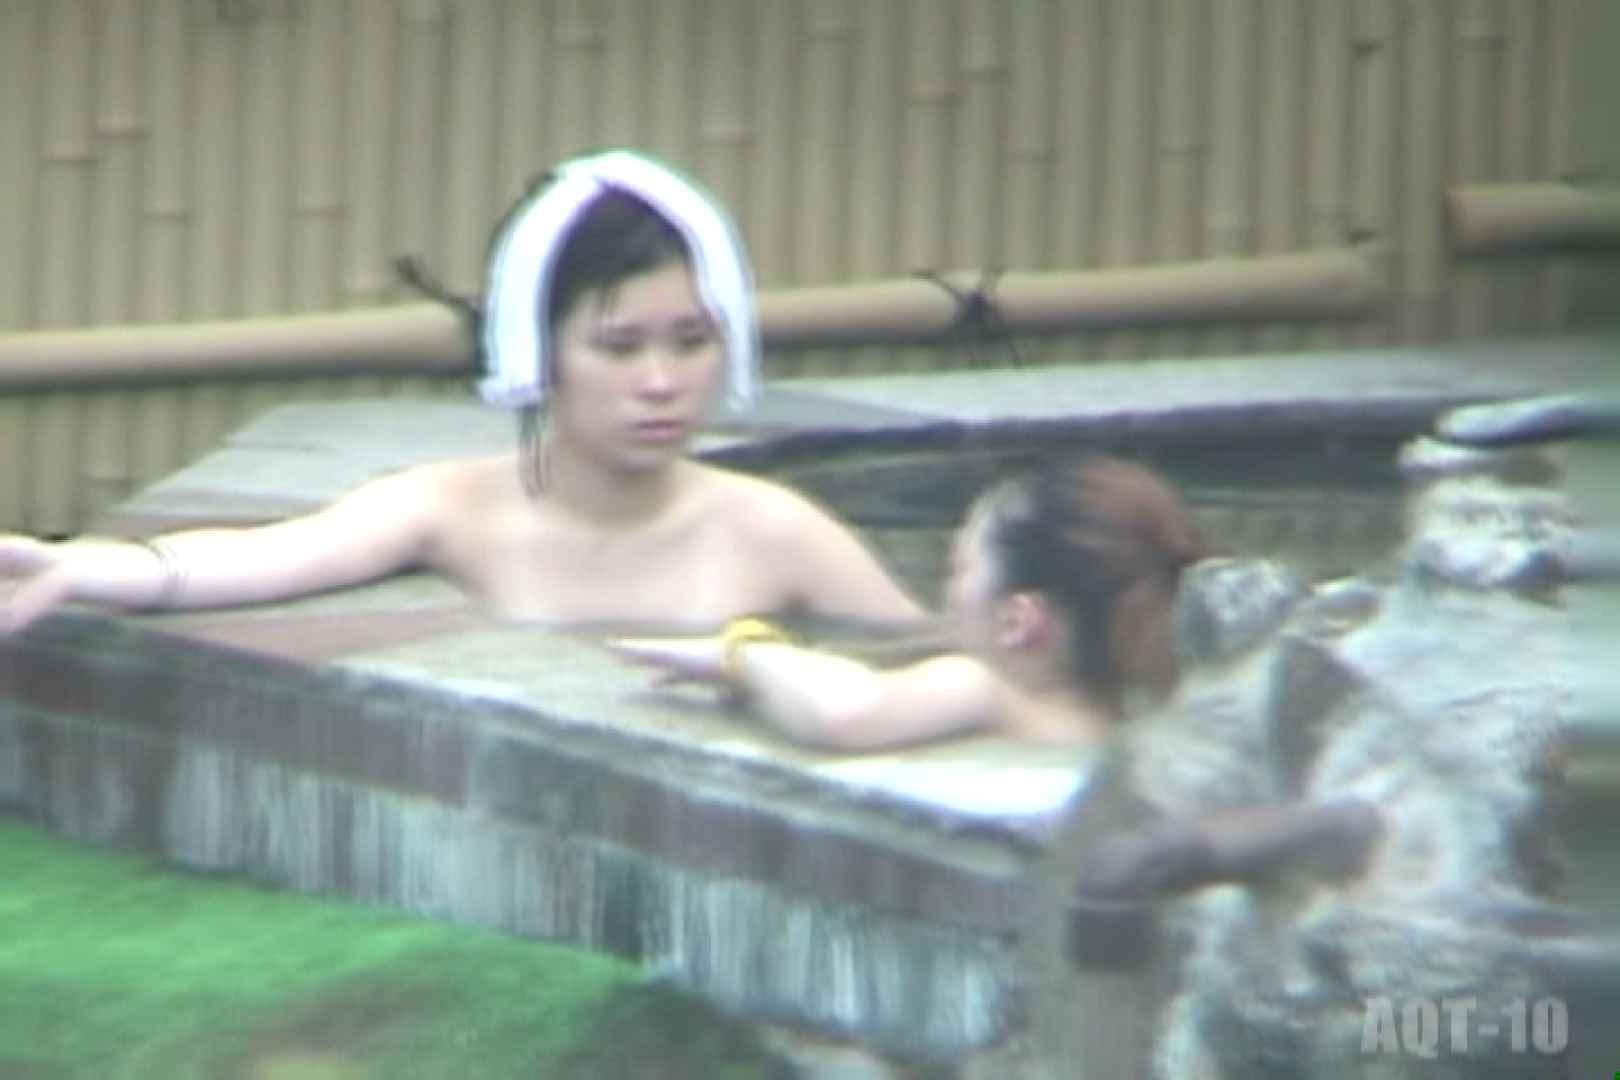 Aquaな露天風呂Vol.792 盗撮   HなOL  103pic 89